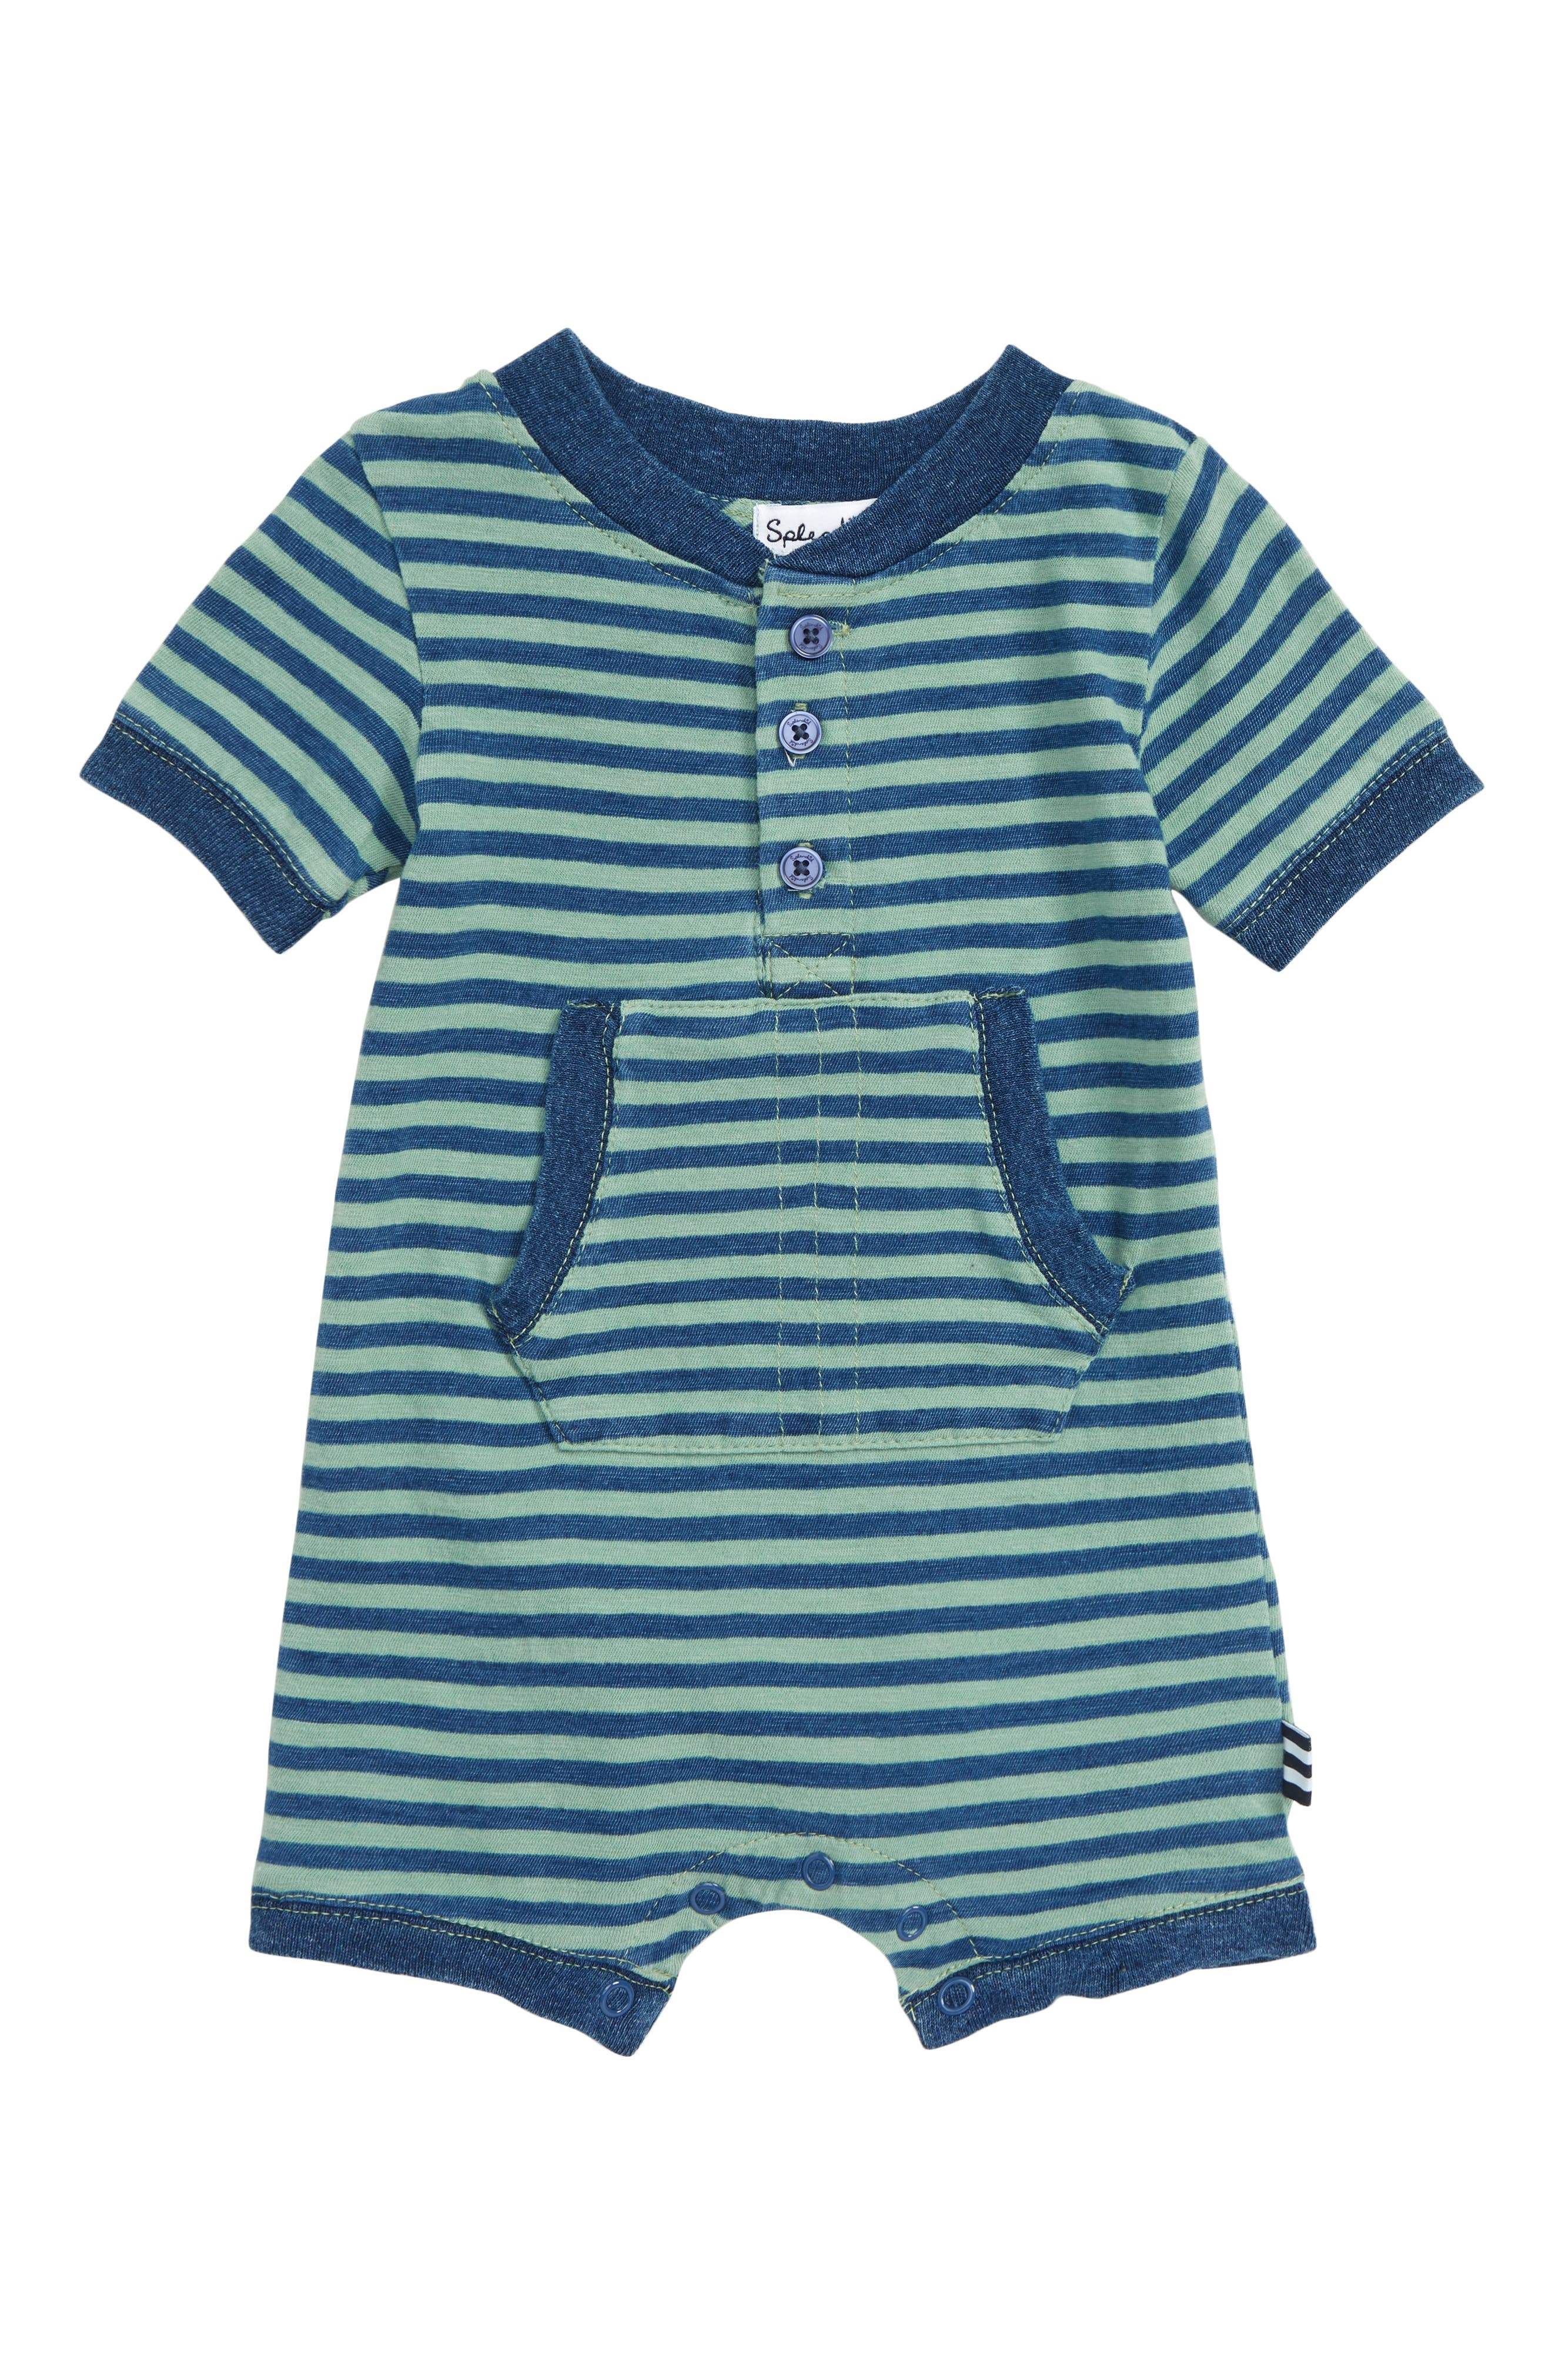 SPLENDID, Indigo Stripe Bodysuit, Main thumbnail 1, color, WAKE GREEN